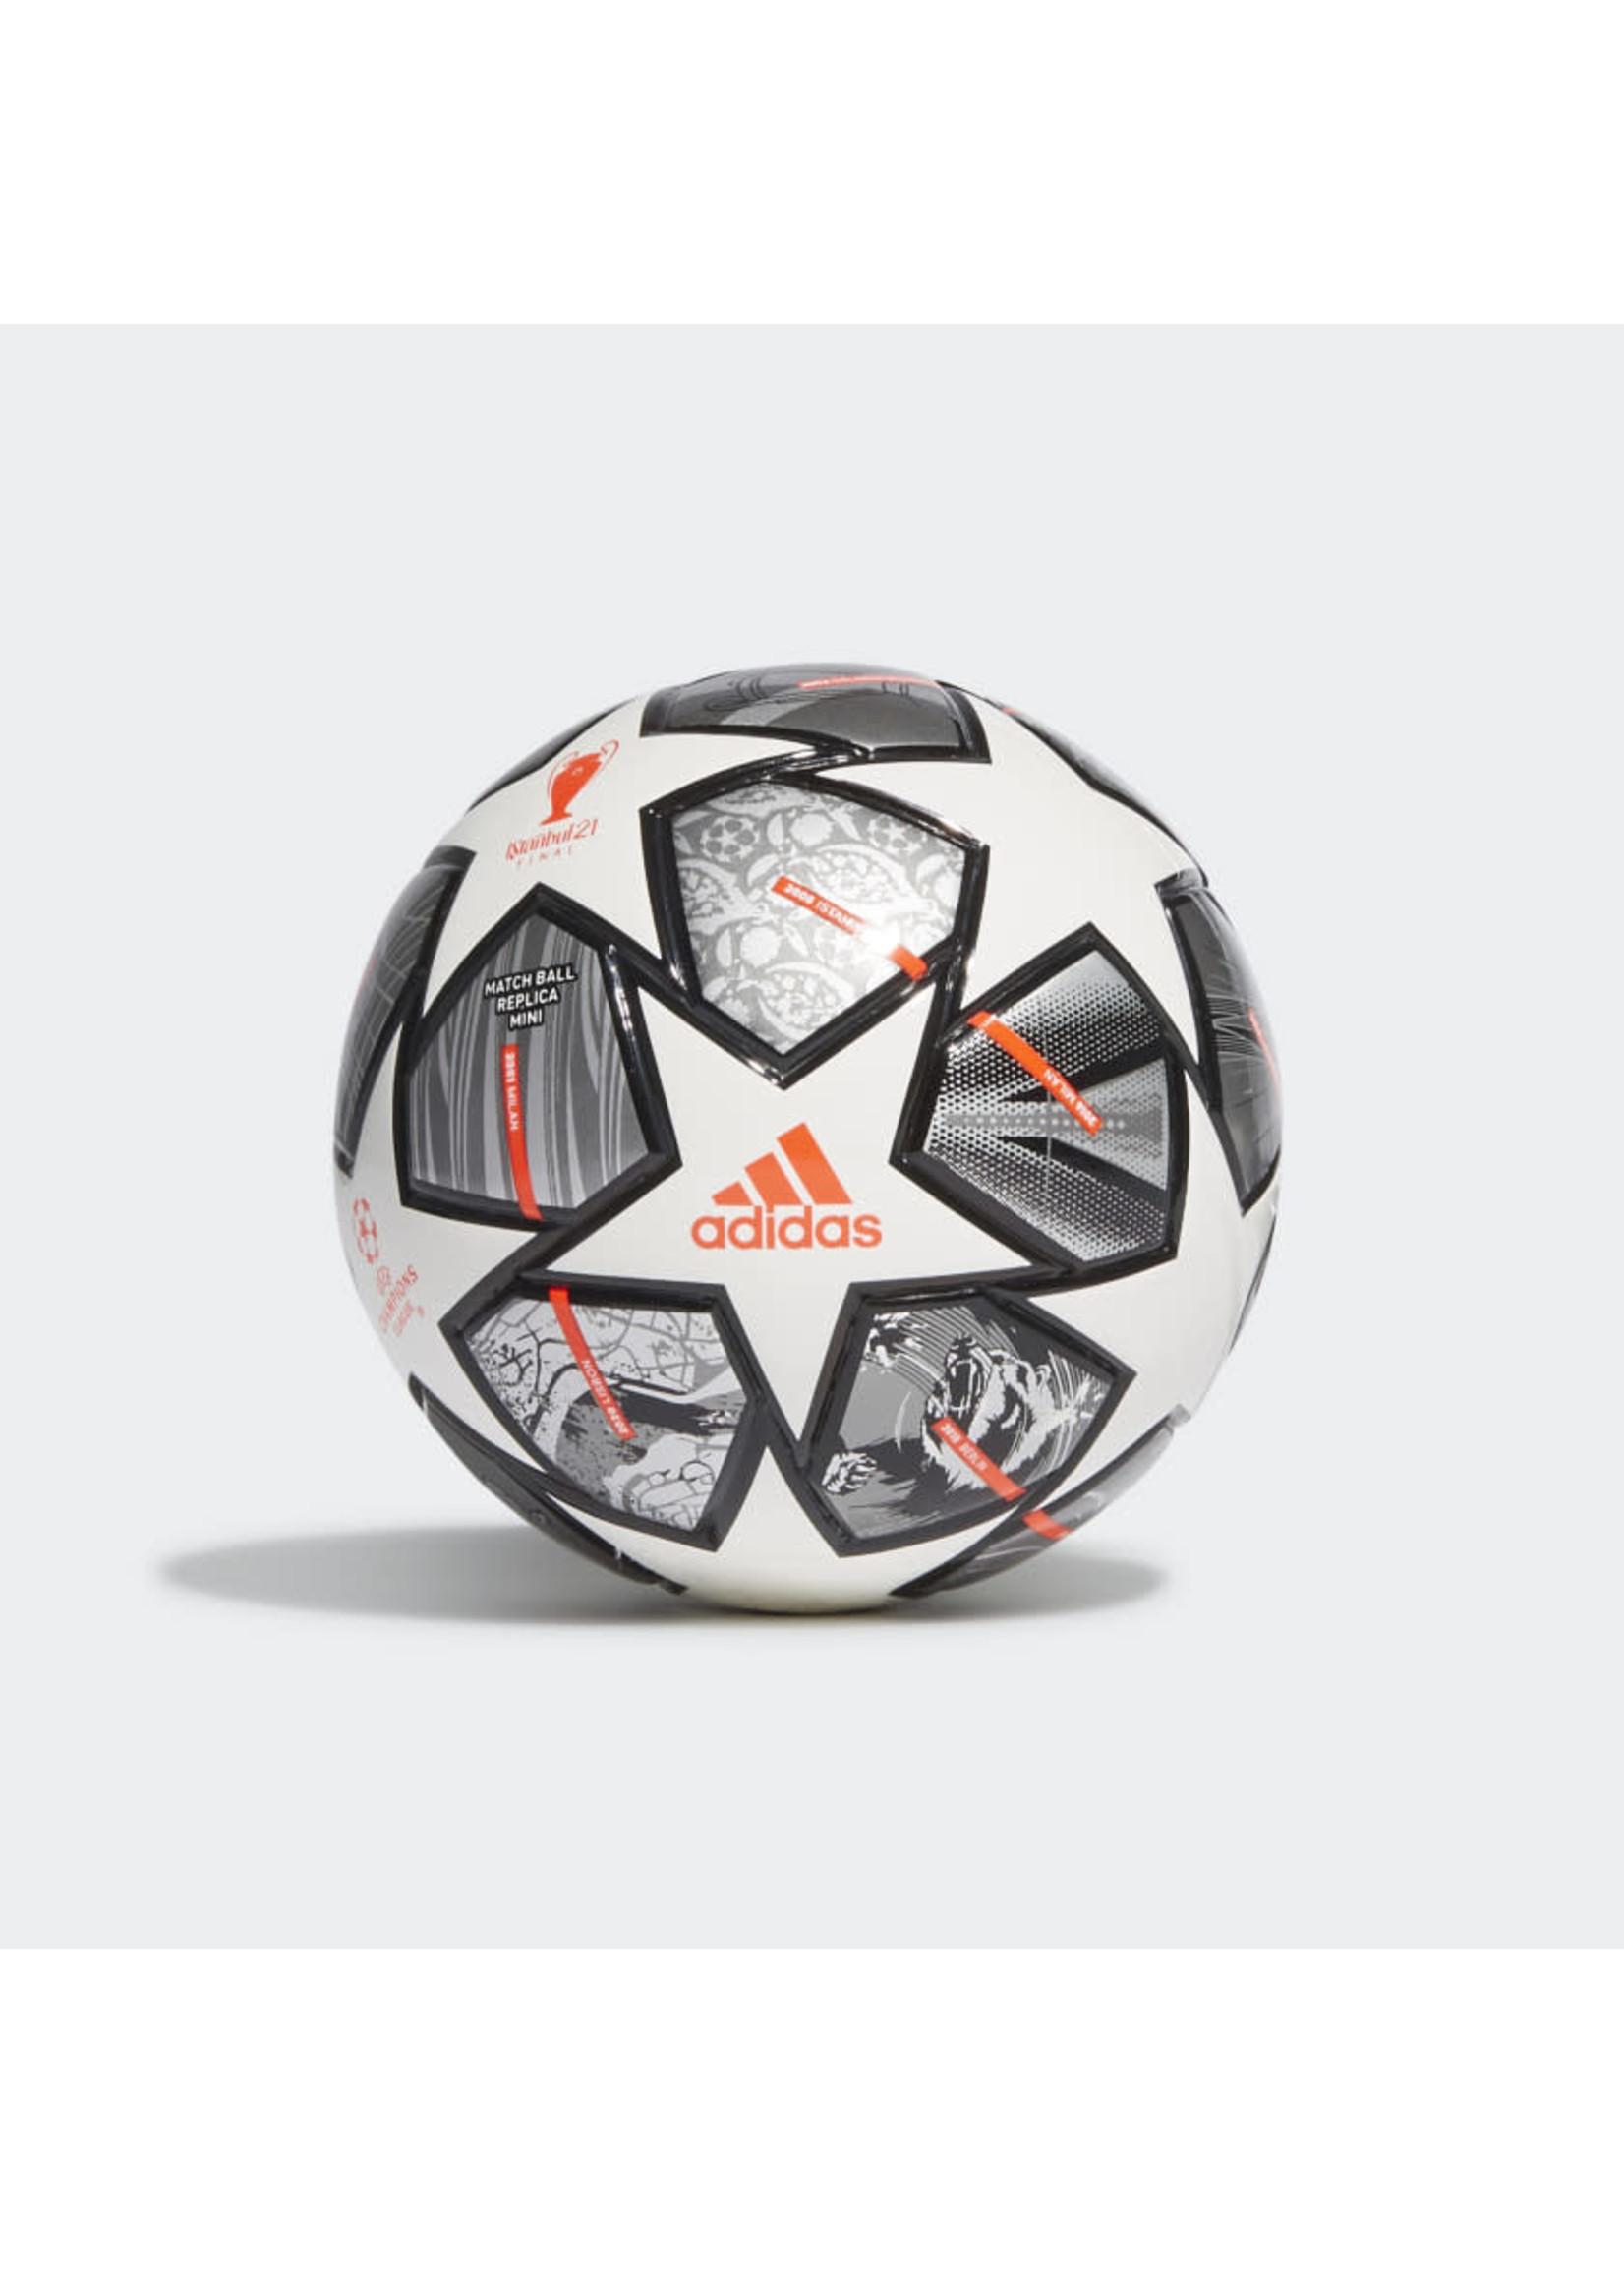 Adidas Champions League Finale